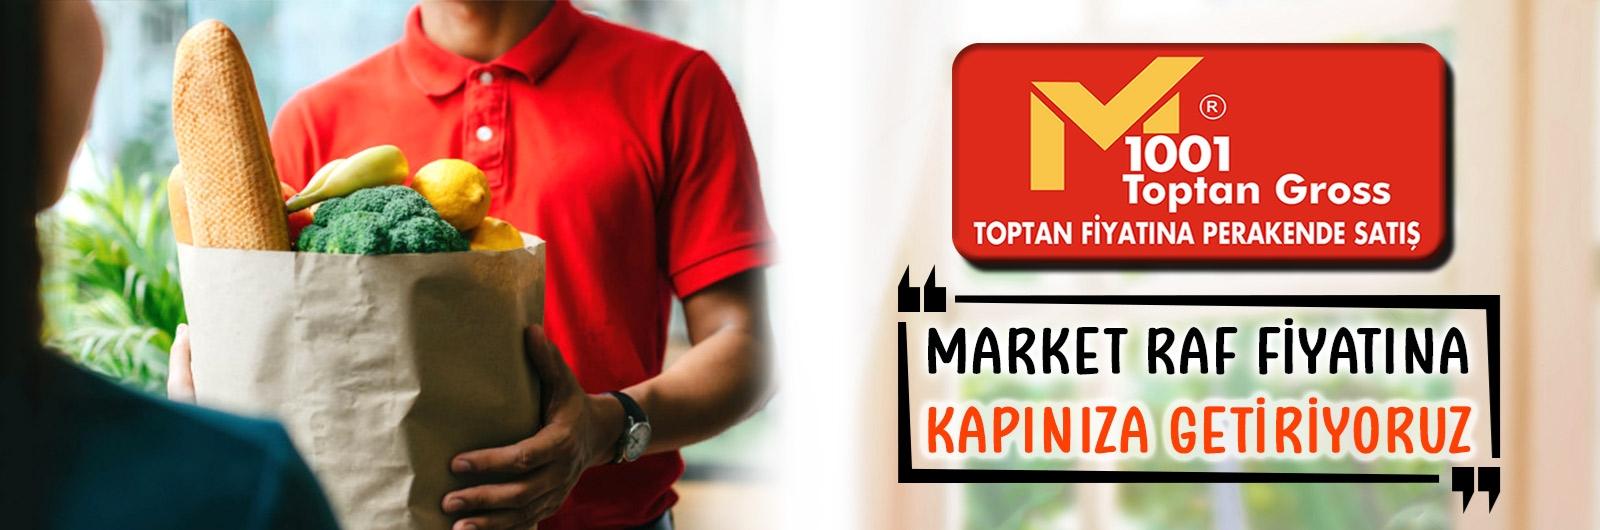 Urfa M1001 Toptan Gross  sanal market